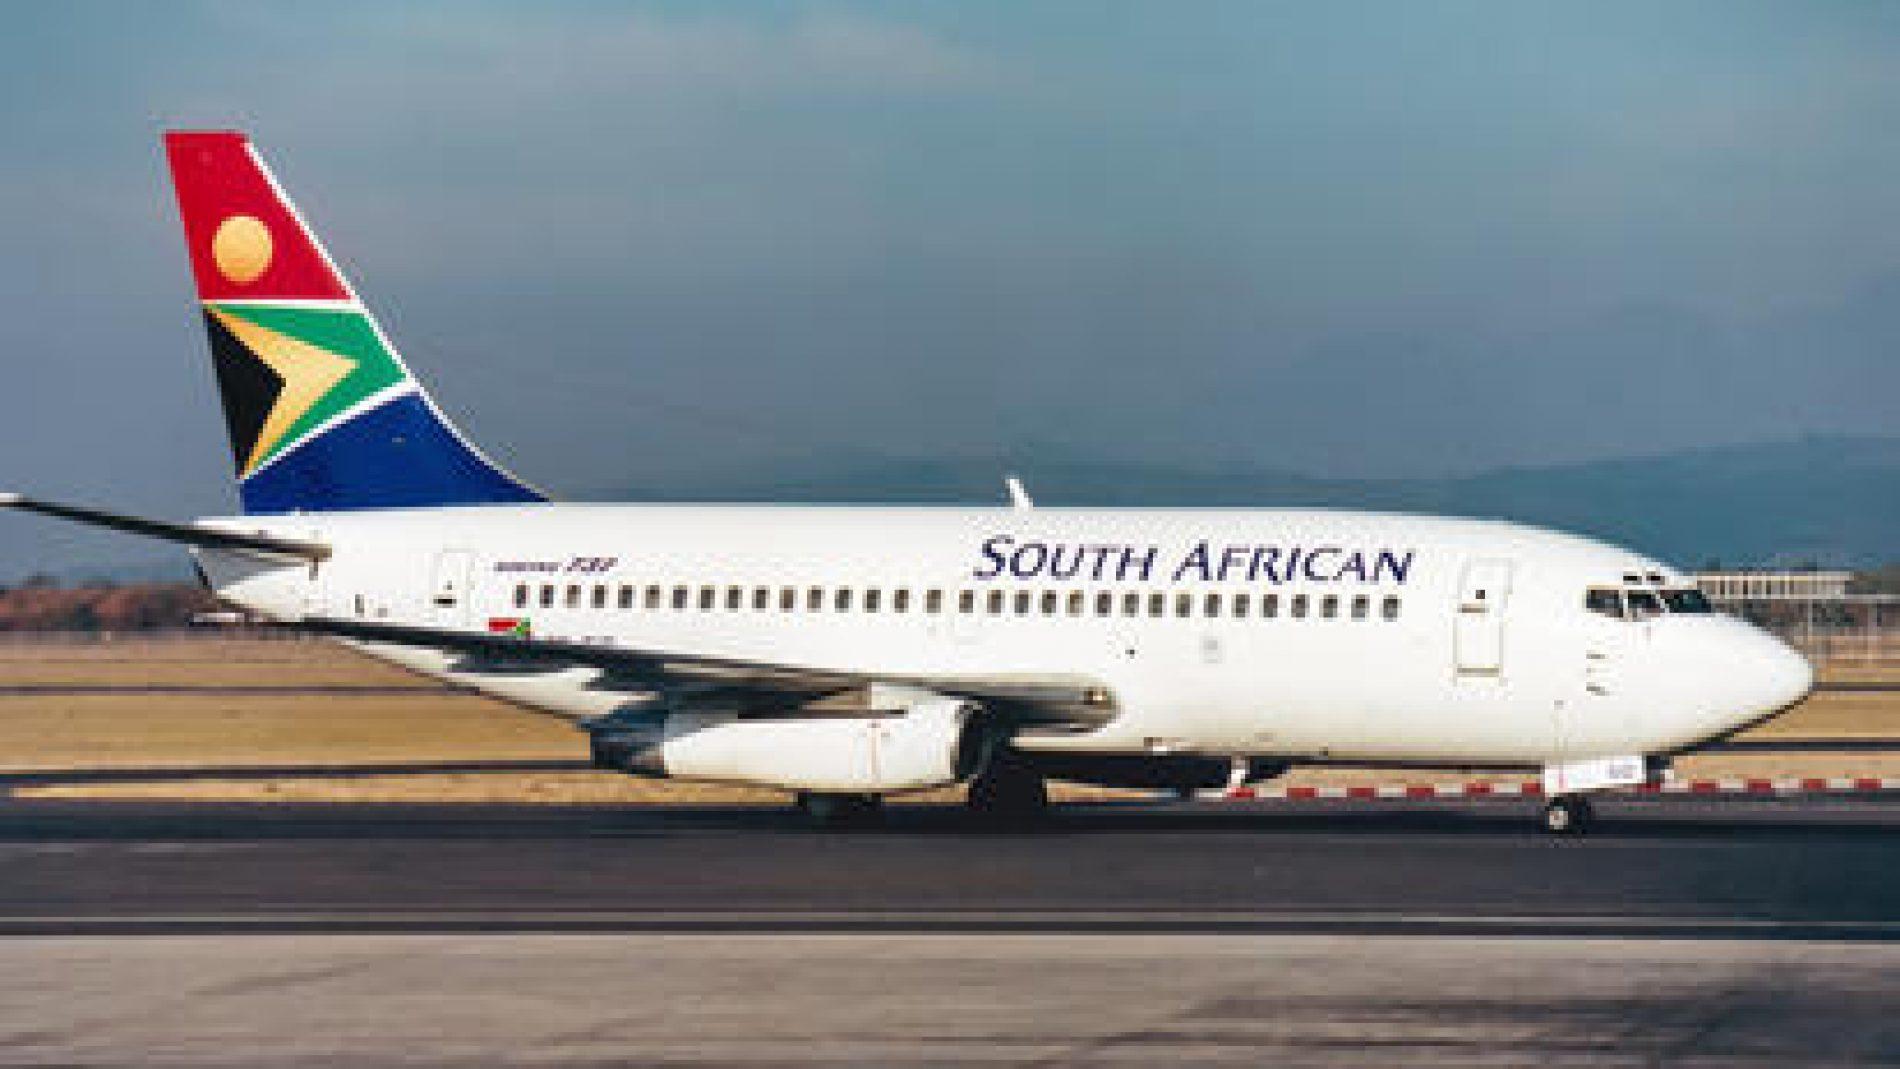 South African Airways, Emotions DMC Promote Destination Mauritius in Nigeria